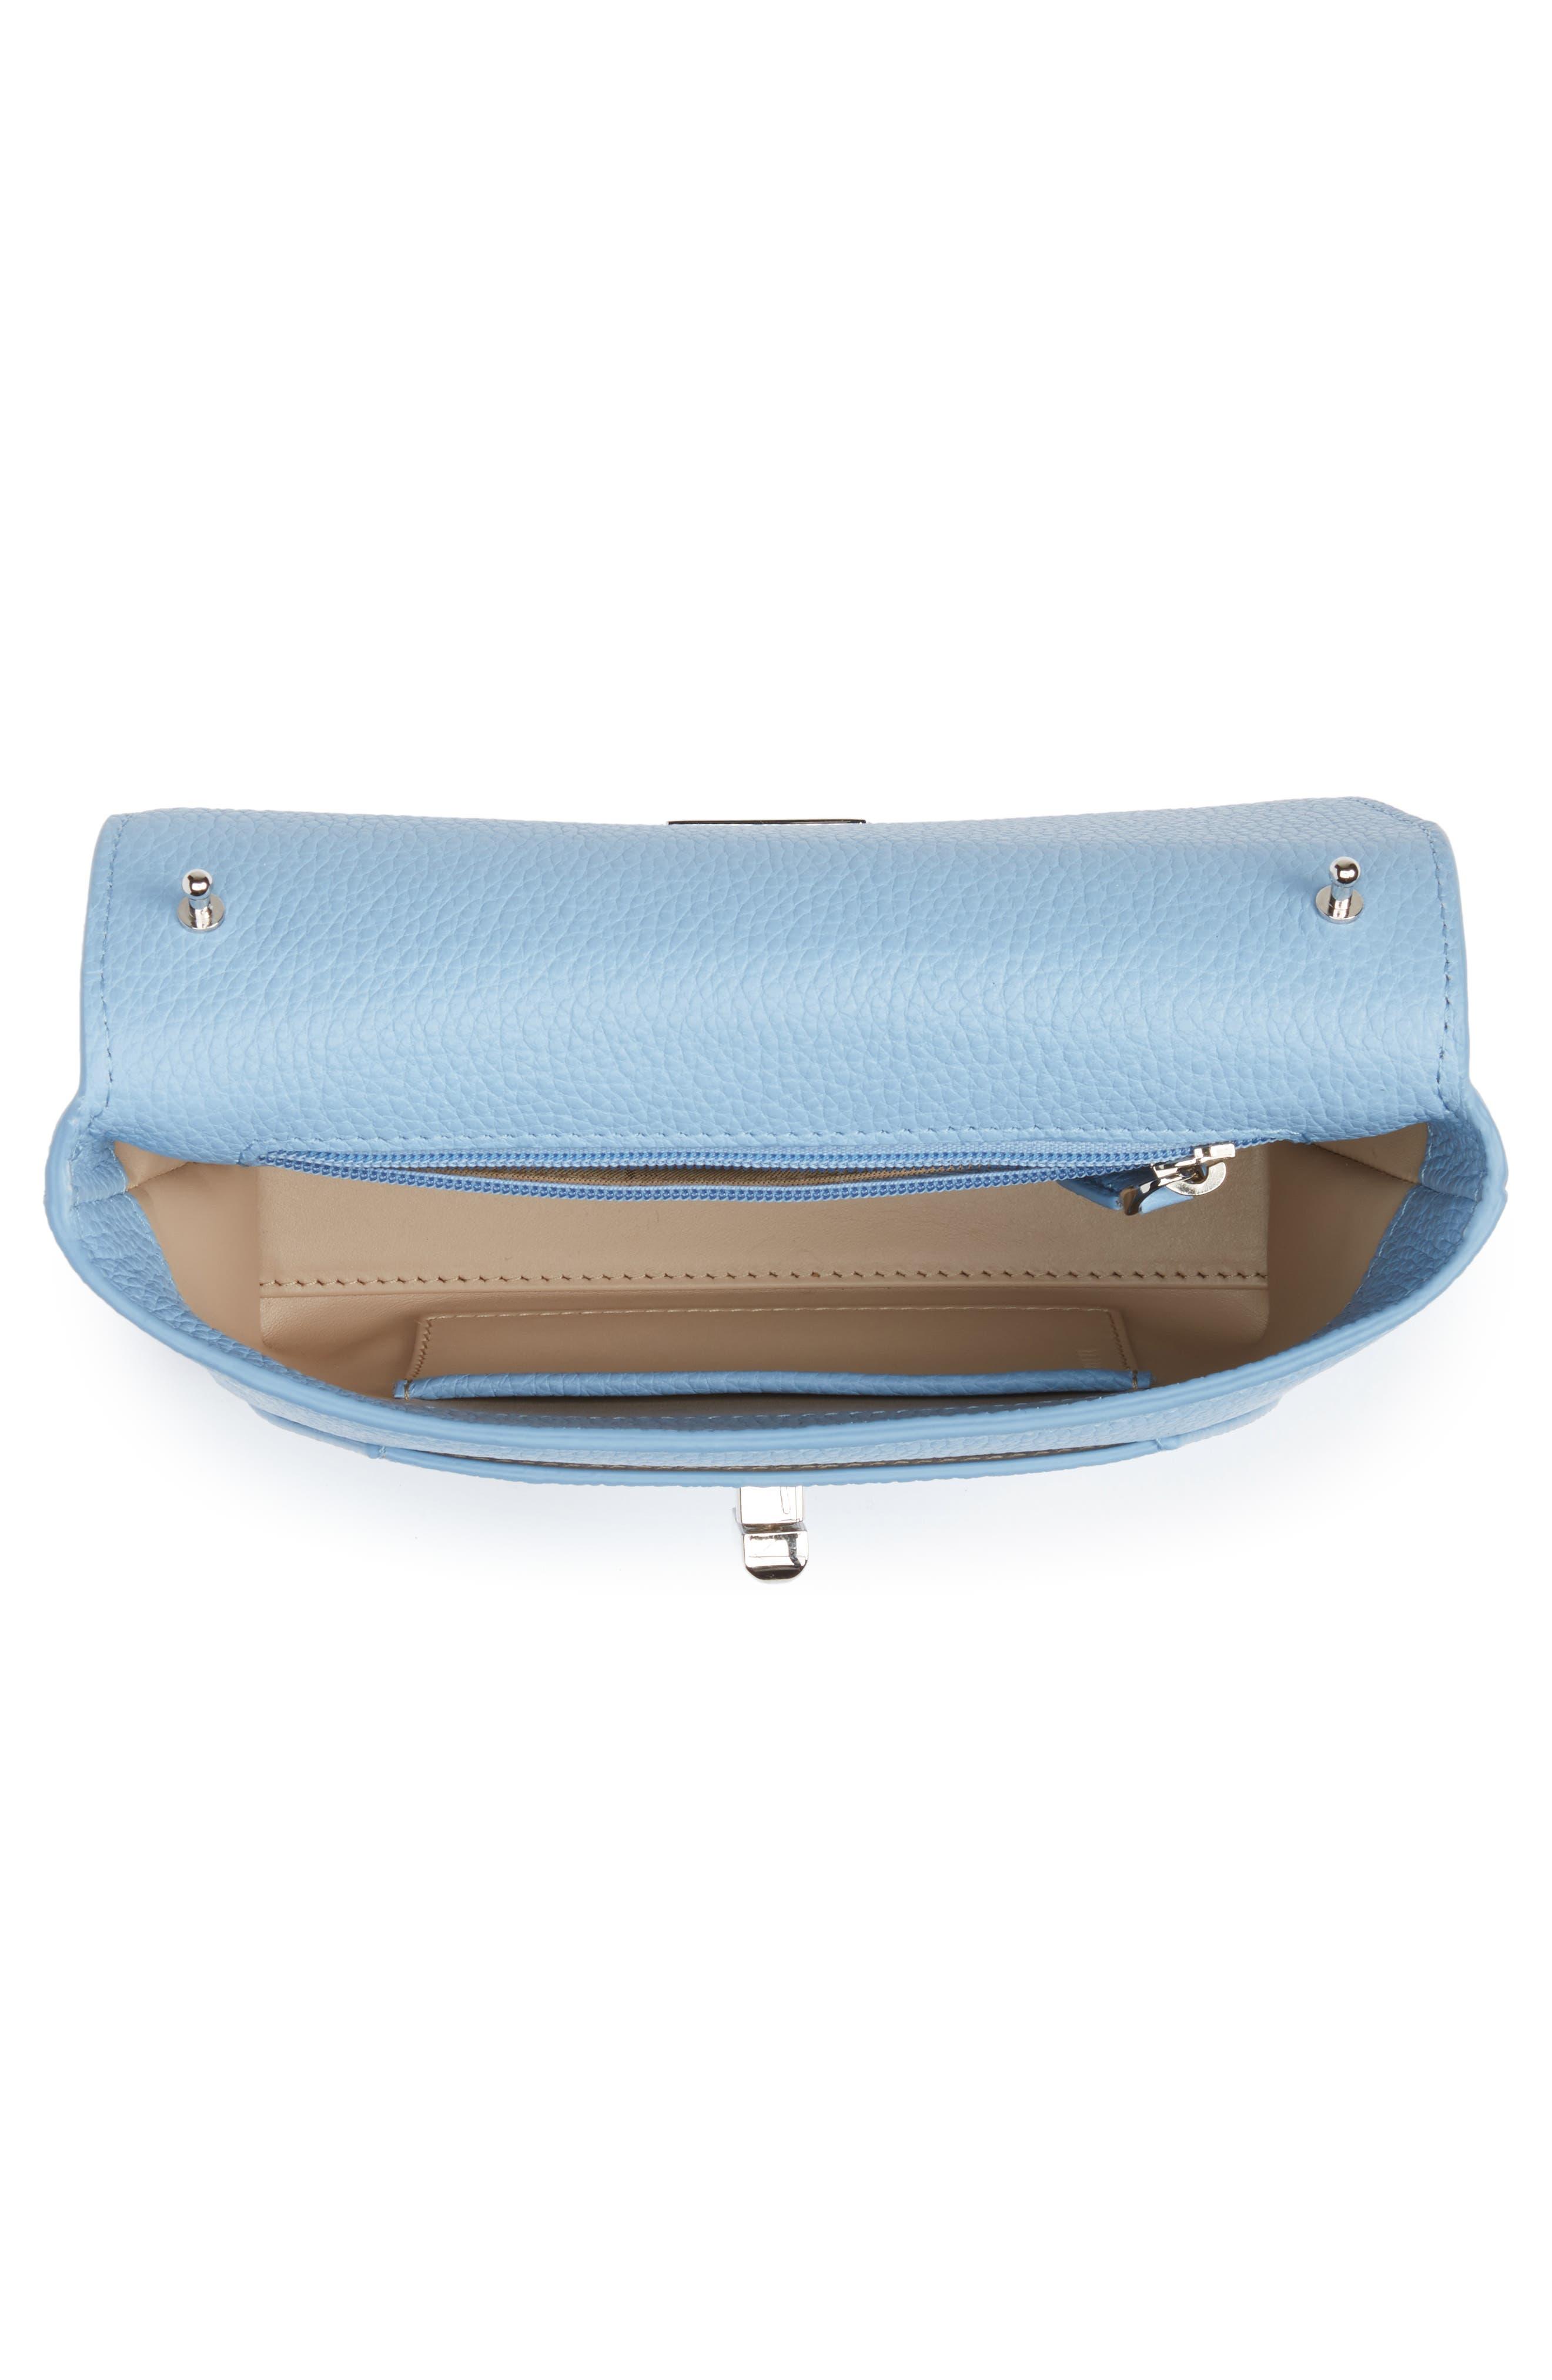 Little Anouk Calfskin Crossbody Bag,                             Alternate thumbnail 5, color,                             POWDER BLUE